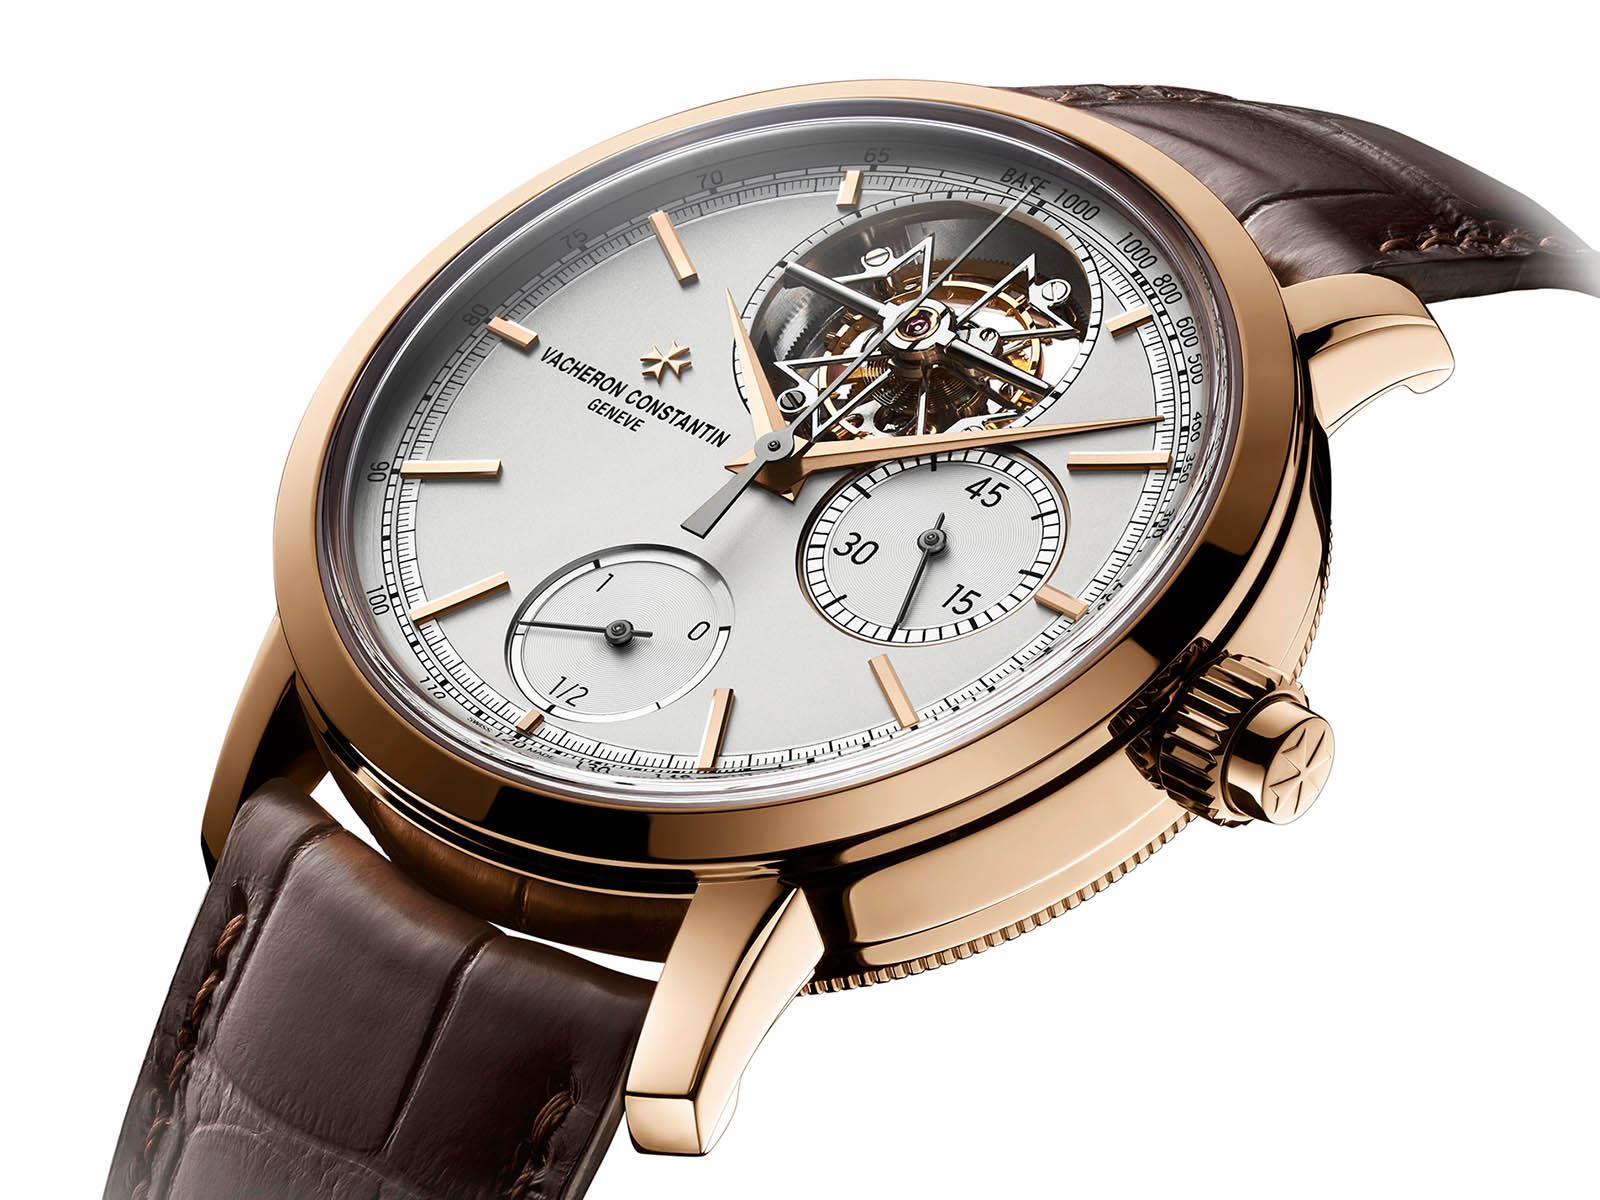 5100t-000r-b623-vacheron-constantin-traditionnelle-tourbillon-chronograph-2.jpg